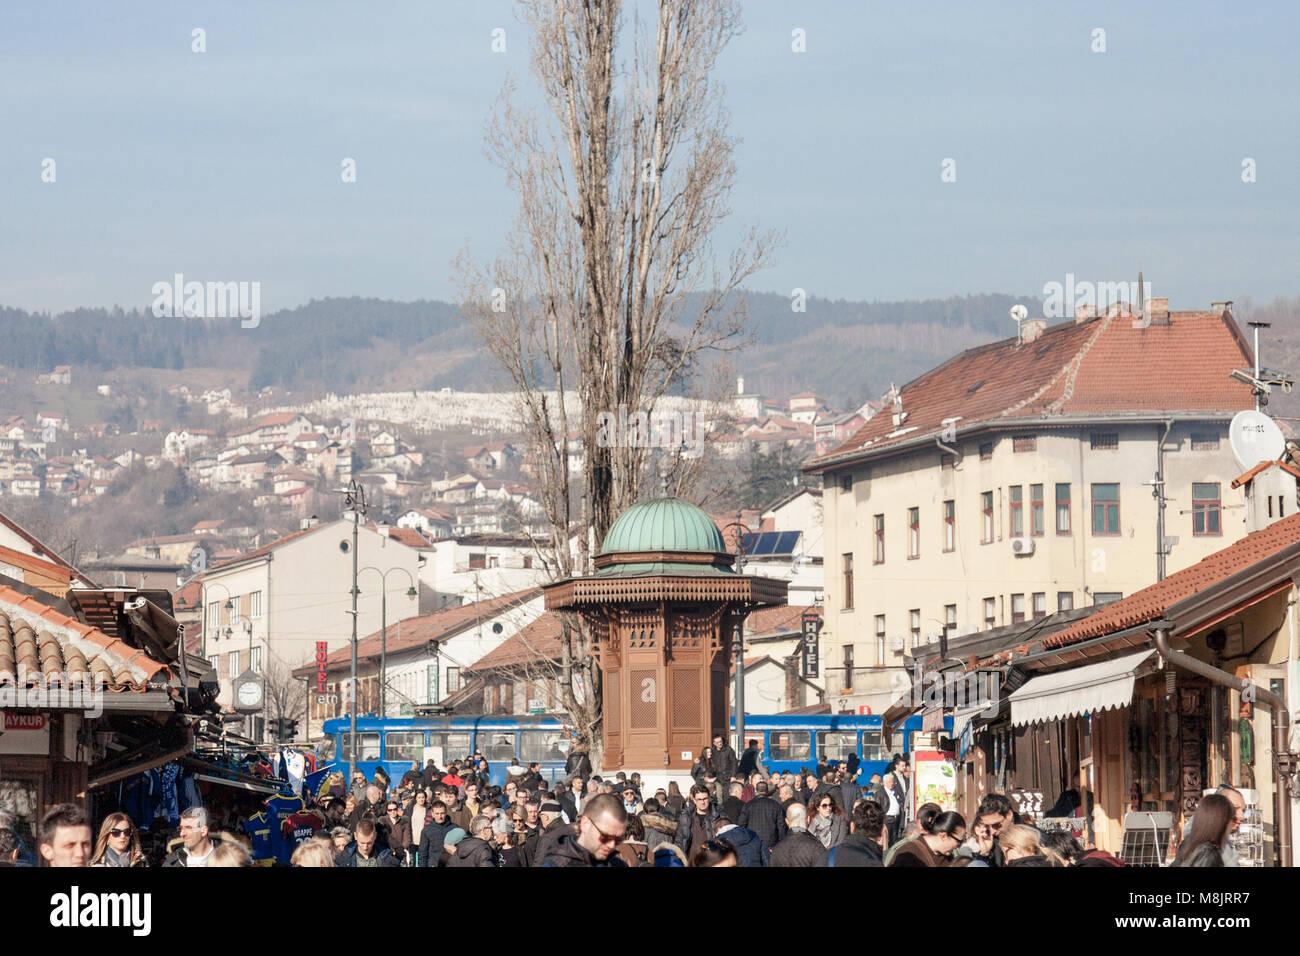 SARAJEVO, BOSNIA AND HERZEGOVINA - FEBRUARY 17, 2018: Crowd of tourists on the Bascarsija square Sebilj fountain. - Stock Image